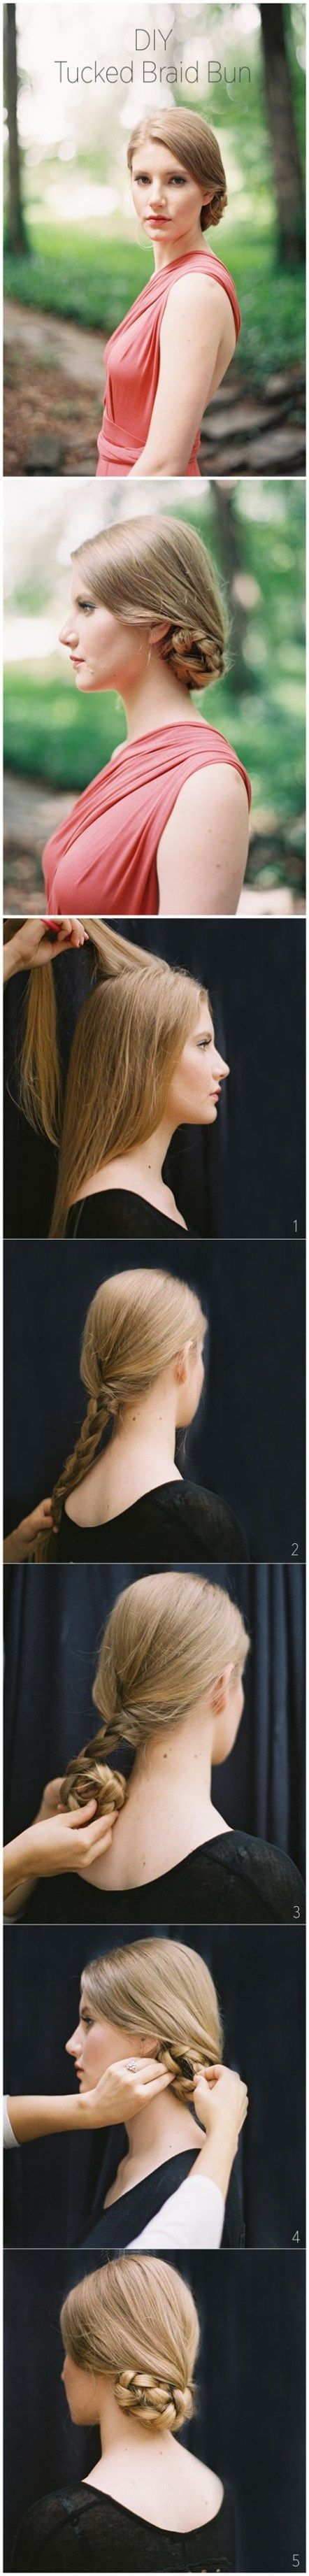 24 + Ideen Haarverlängerungen Clip in Brötchen Frisuren - #Bun #Clip #Extensions #Haar #Frisuren